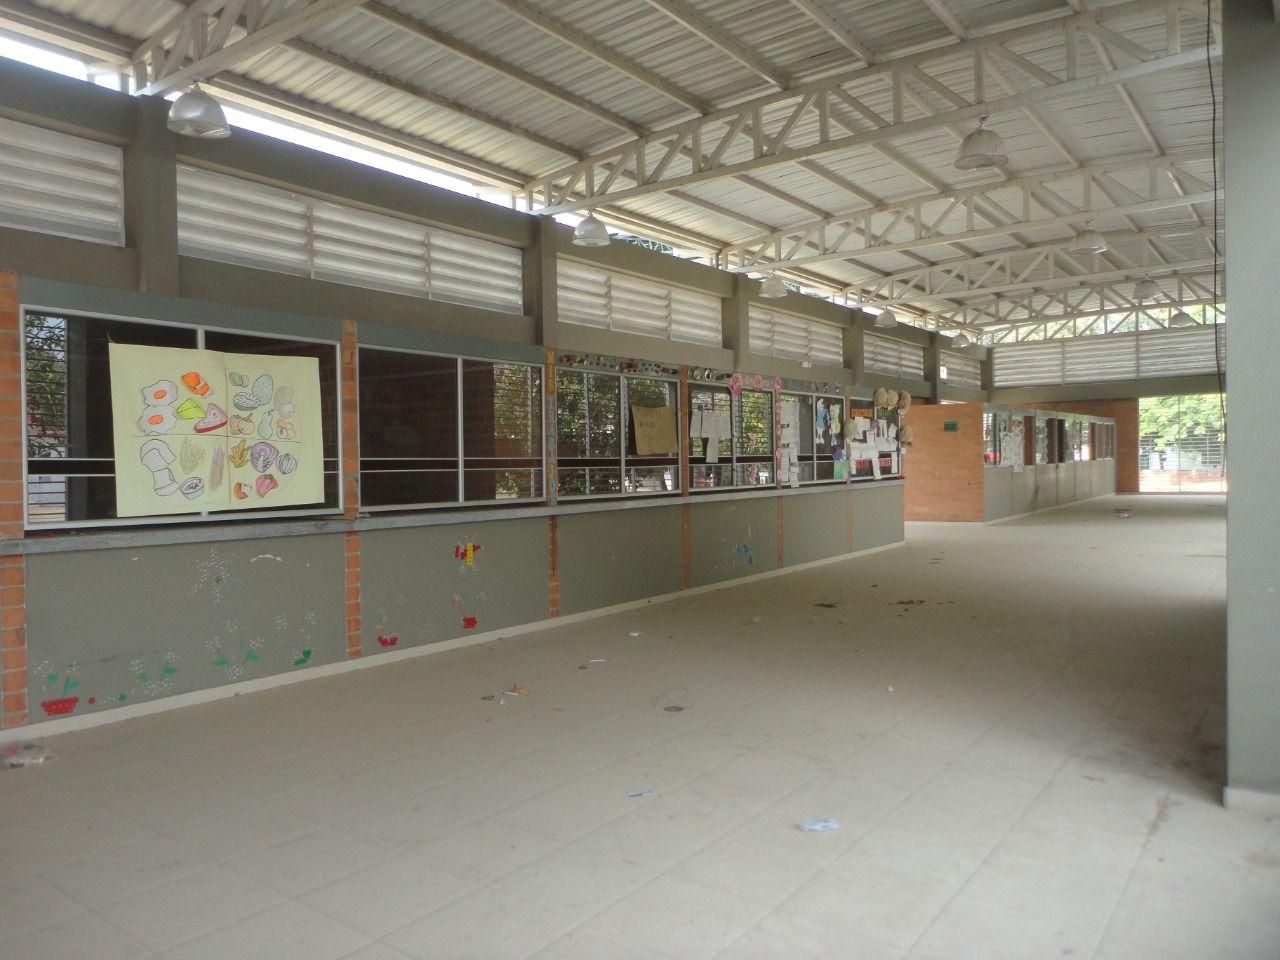 Terminal de transportes de Carmen de Apicalá: Un elefante blanco